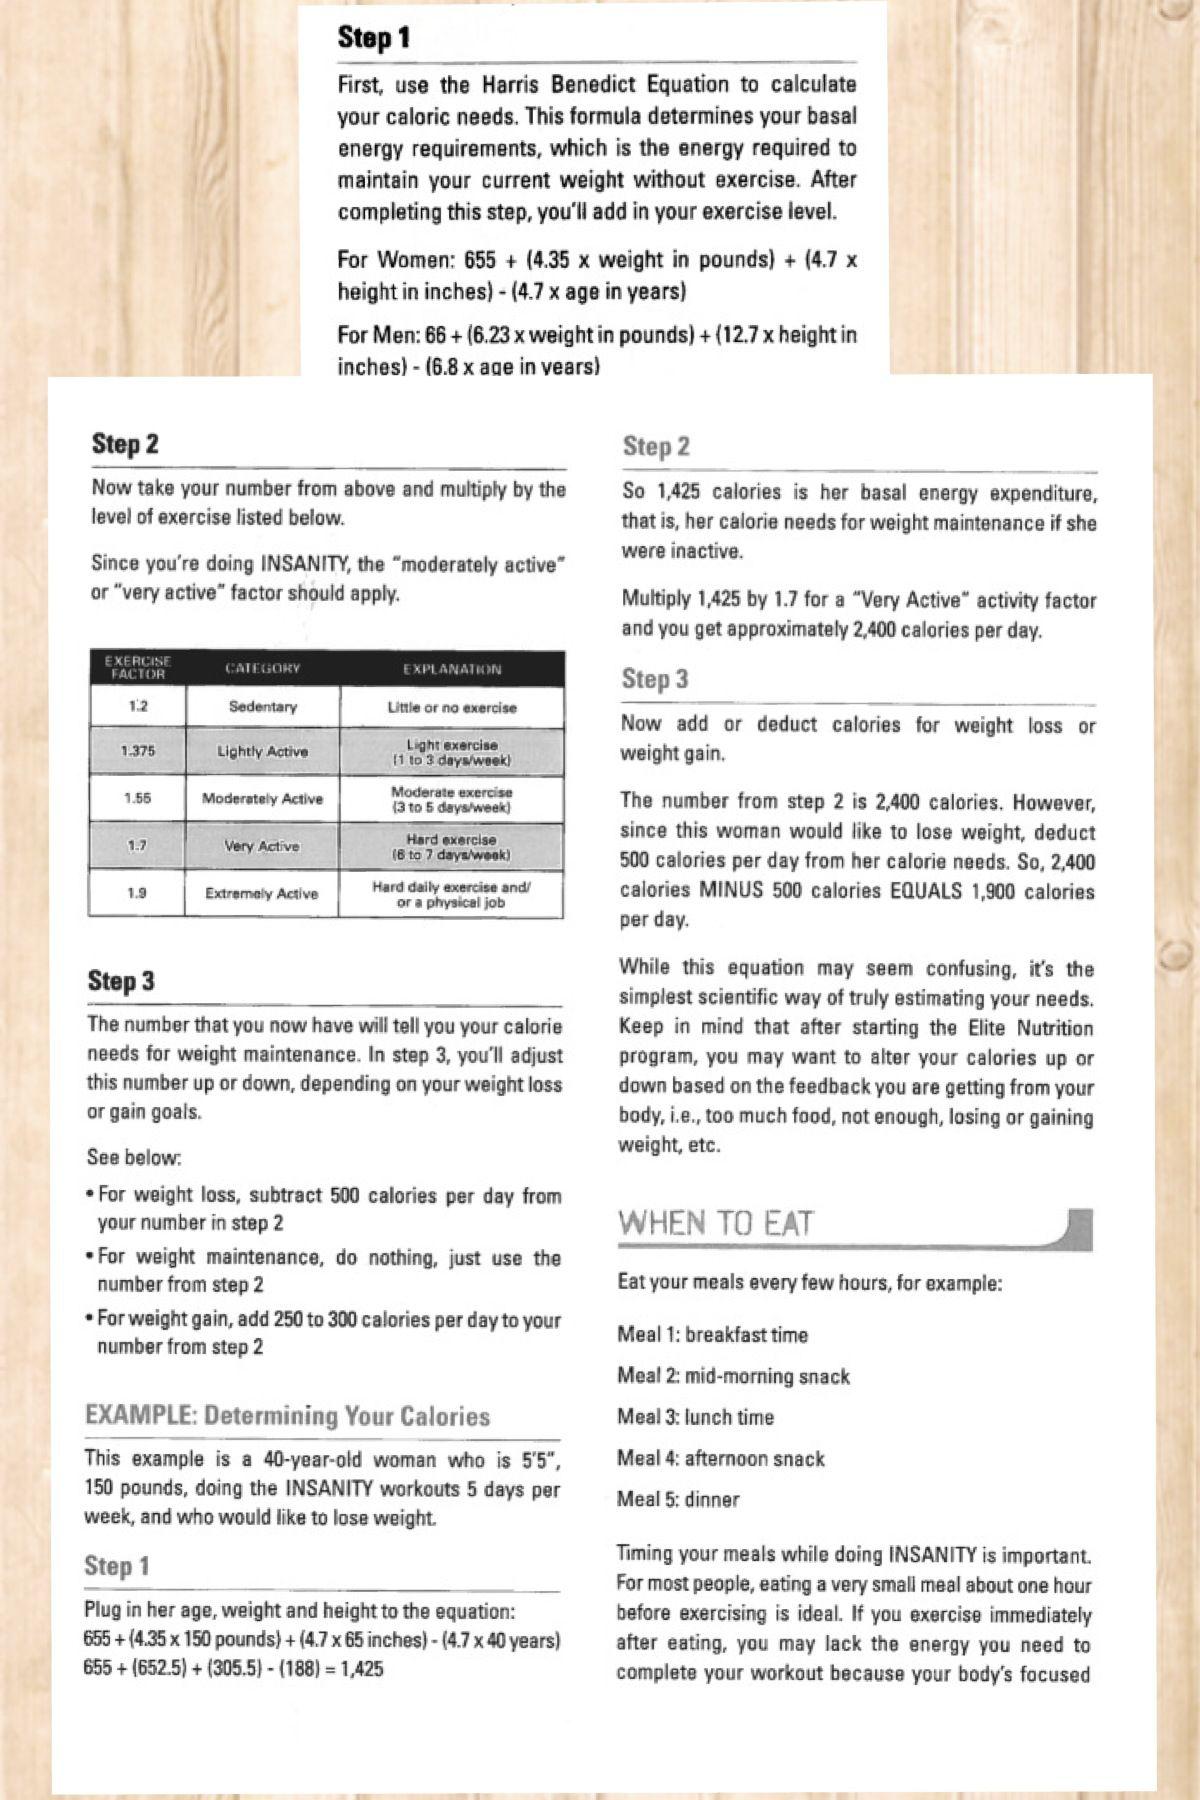 harris benedict equation insanity nutrition guide health fitness rh pinterest com nutrition guide insanity francais insanity nutrition guide pdf free